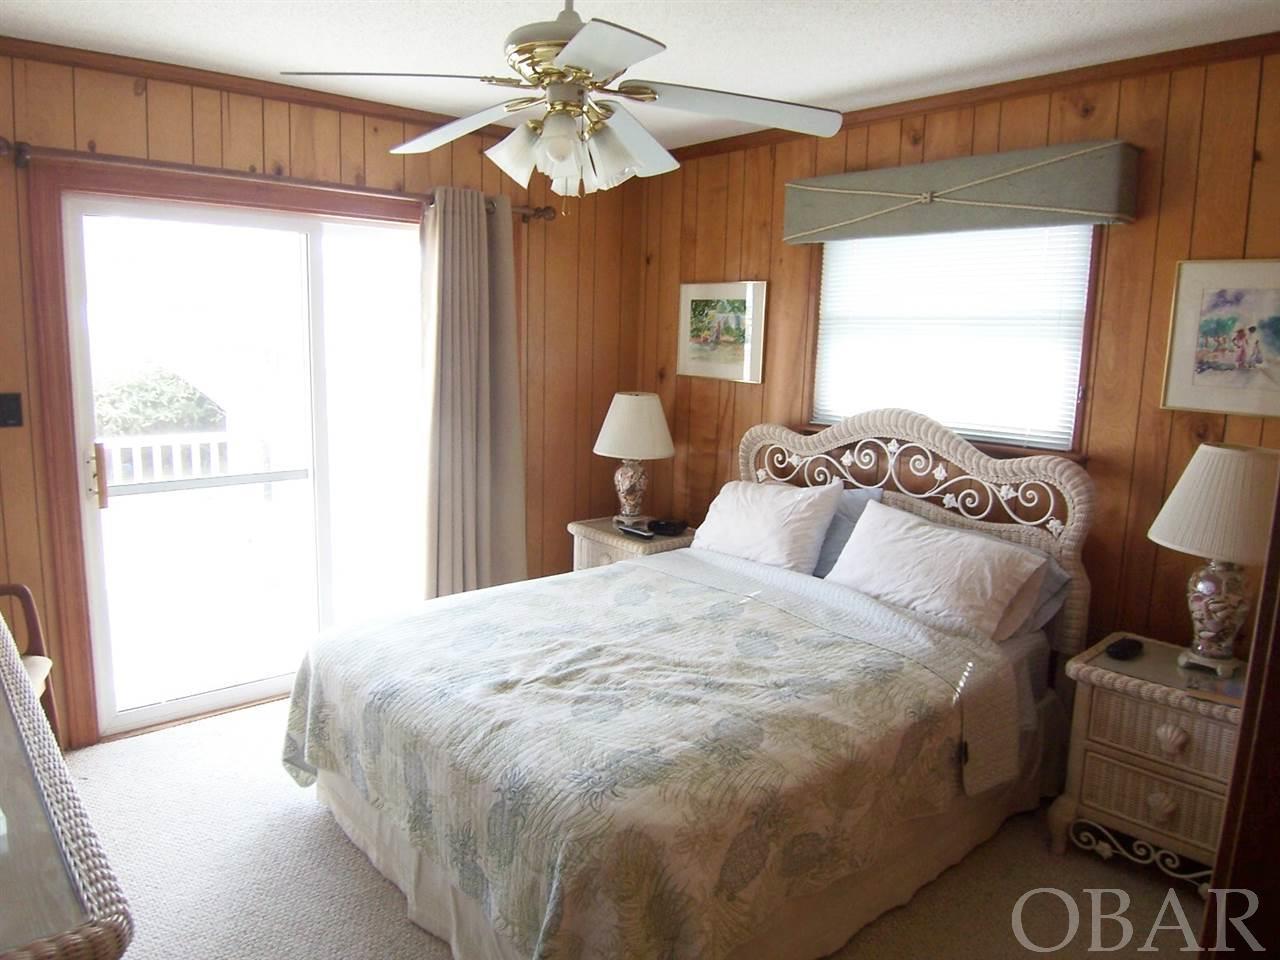 4423 Lindbergh Avenue,Kitty Hawk,NC 27949,4 Bedrooms Bedrooms,2 BathroomsBathrooms,Residential,Lindbergh Avenue,97962